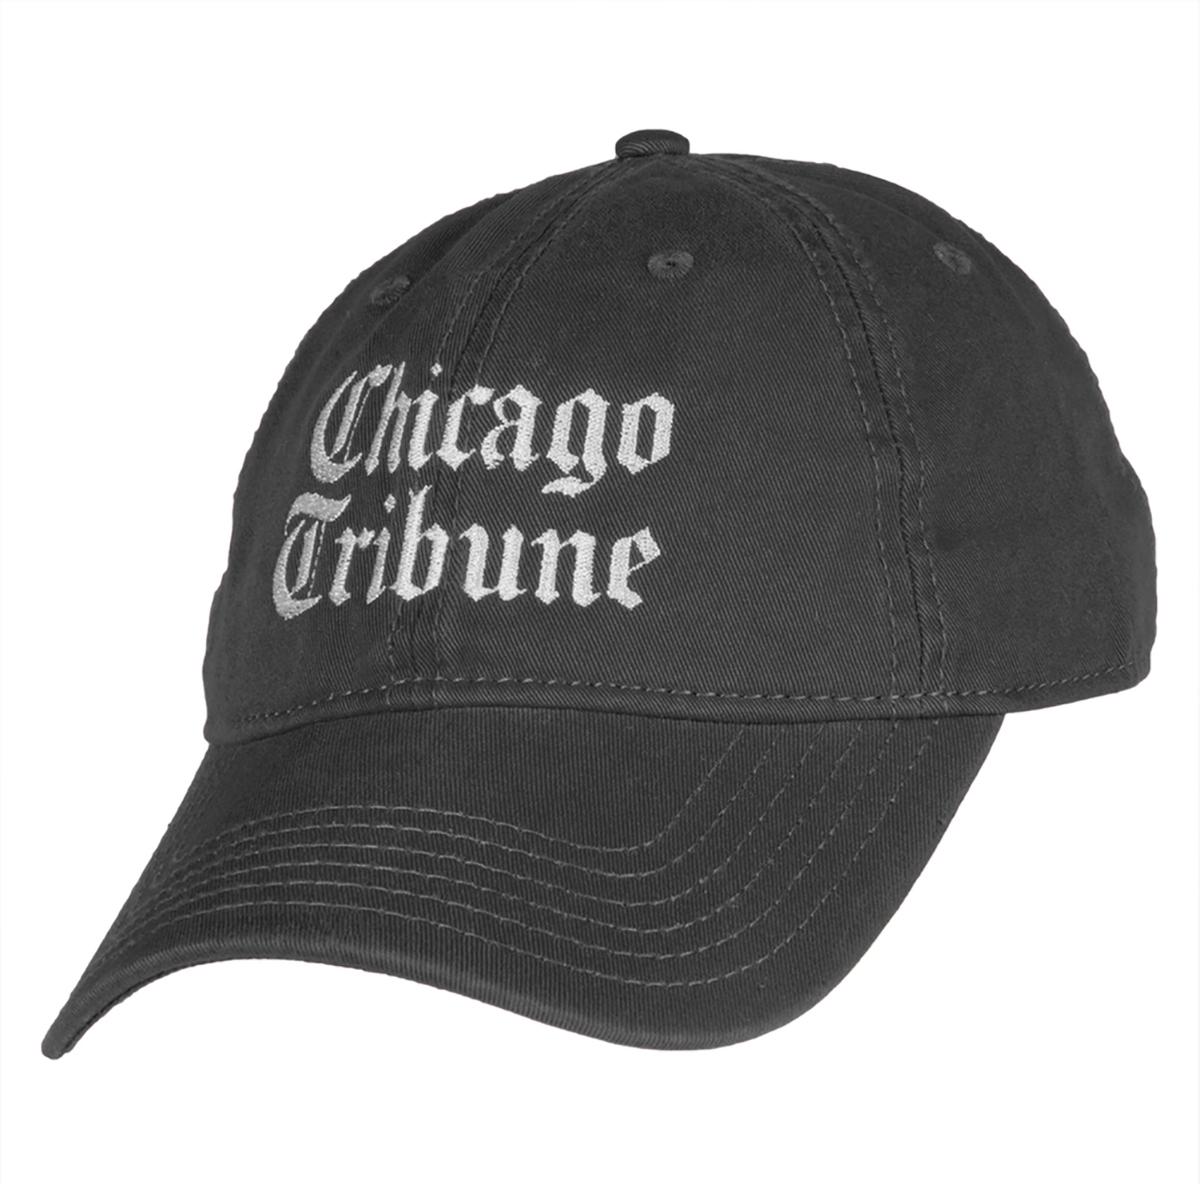 Chicago Tribune Grey Adjustable Cap